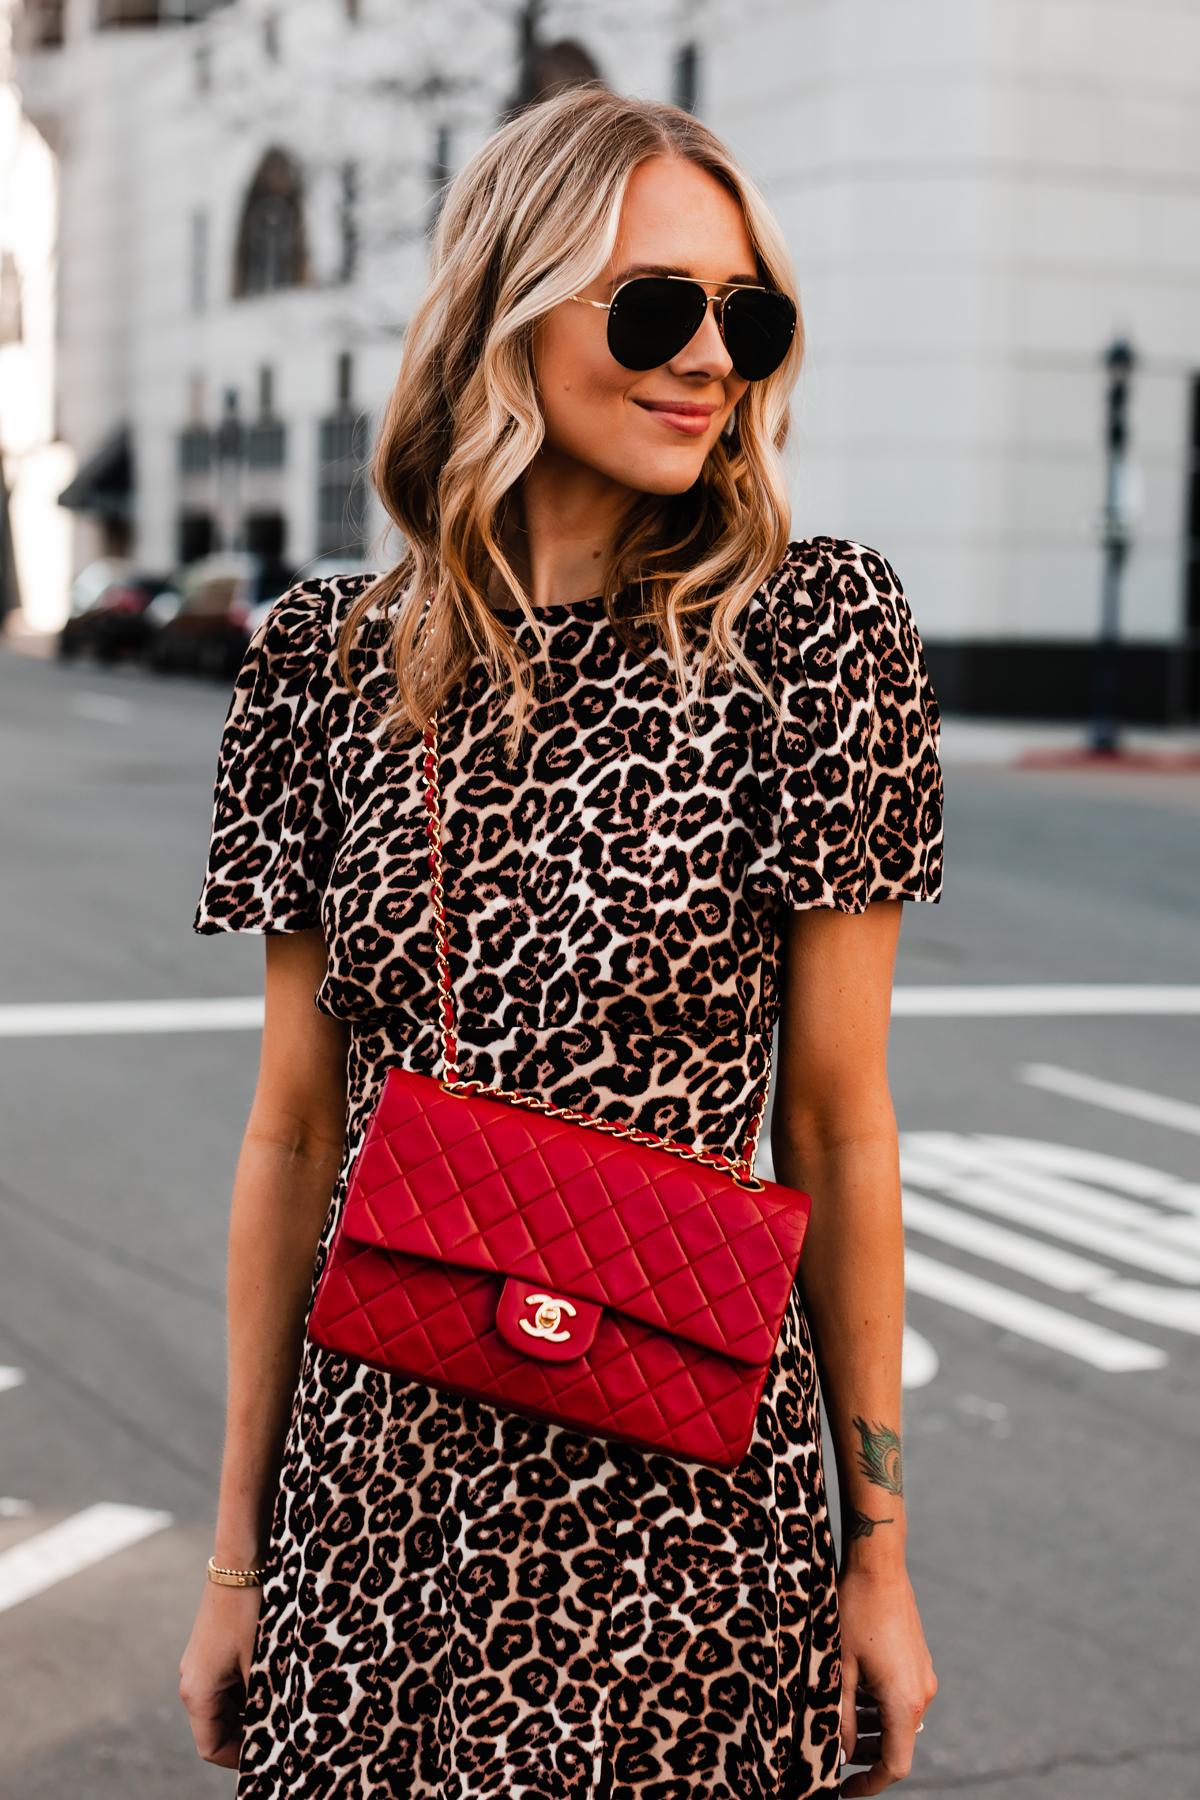 Blonde Woman Wearing Leopard Dress Red Chanel Handbag Fashion Jackson San Diego Fashion Blogger Street Style